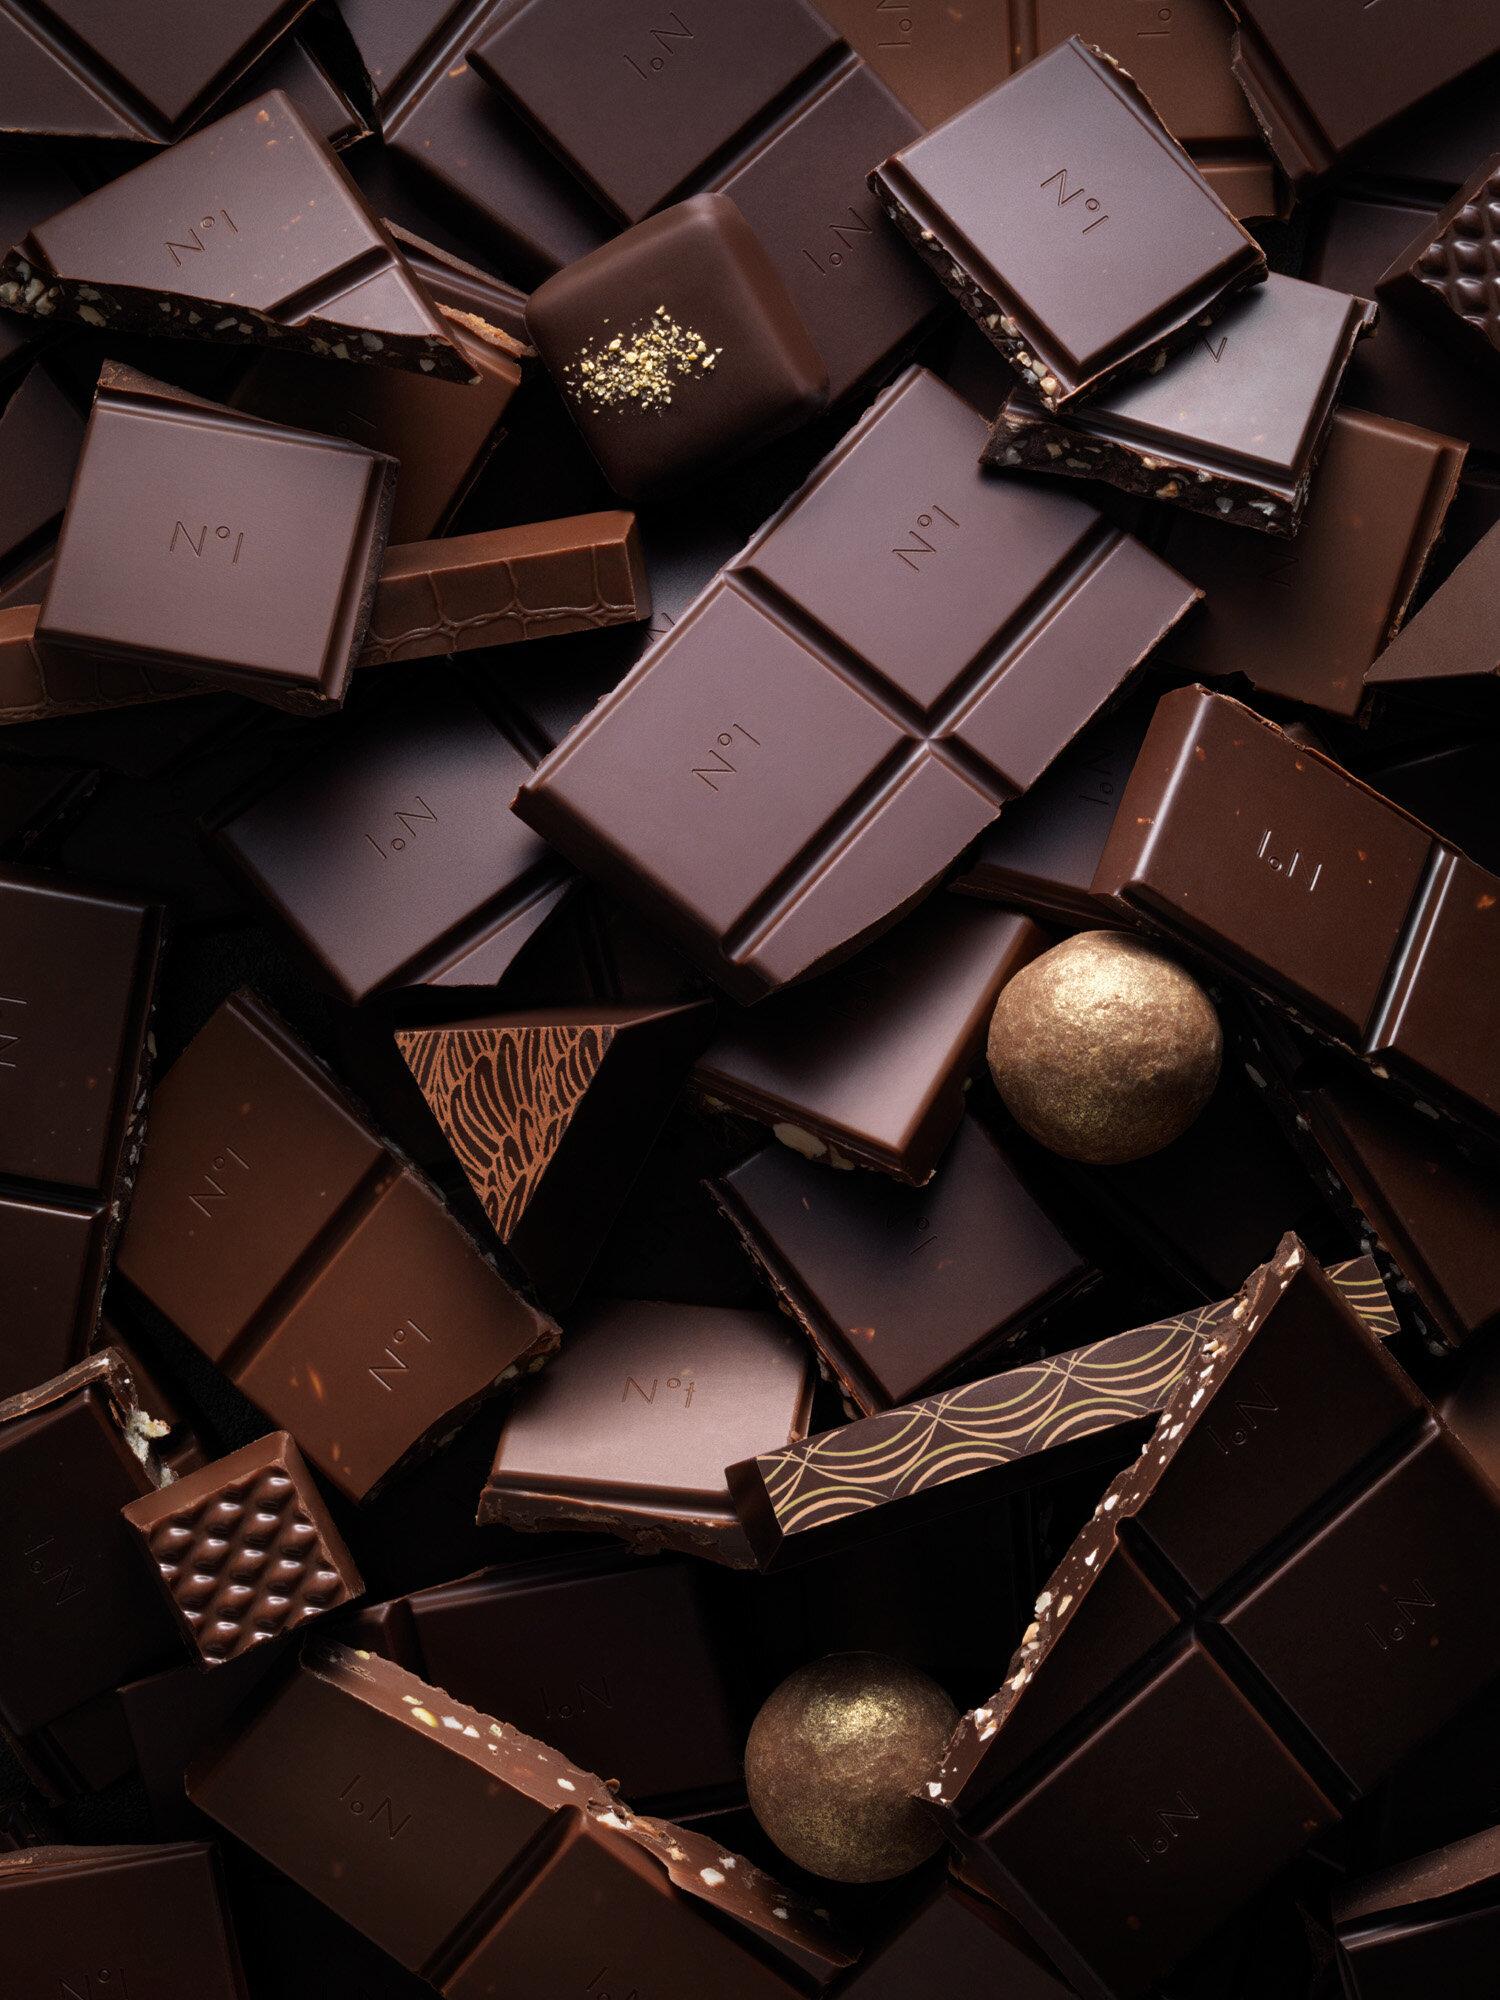 No1Range_ChocolateBars_31.7.19-0323_w1 (1).jpg